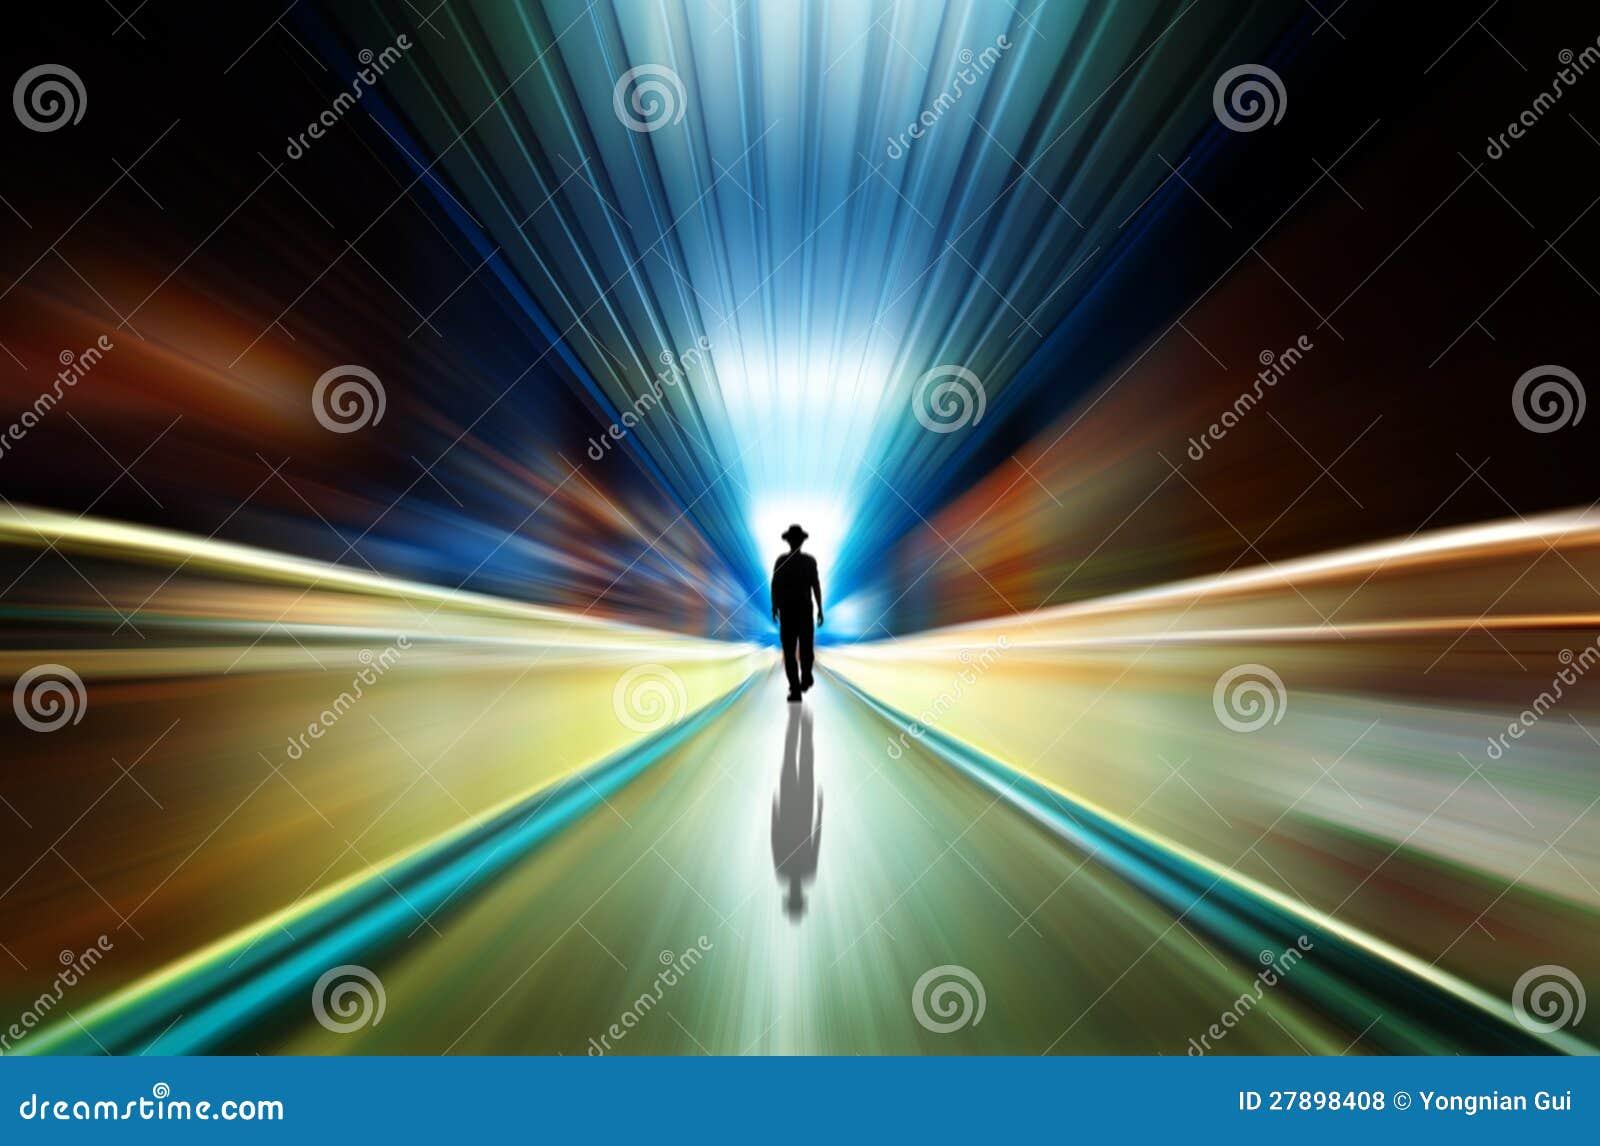 Silhouet in een metrotunnel. Licht op Eind van Tunnel